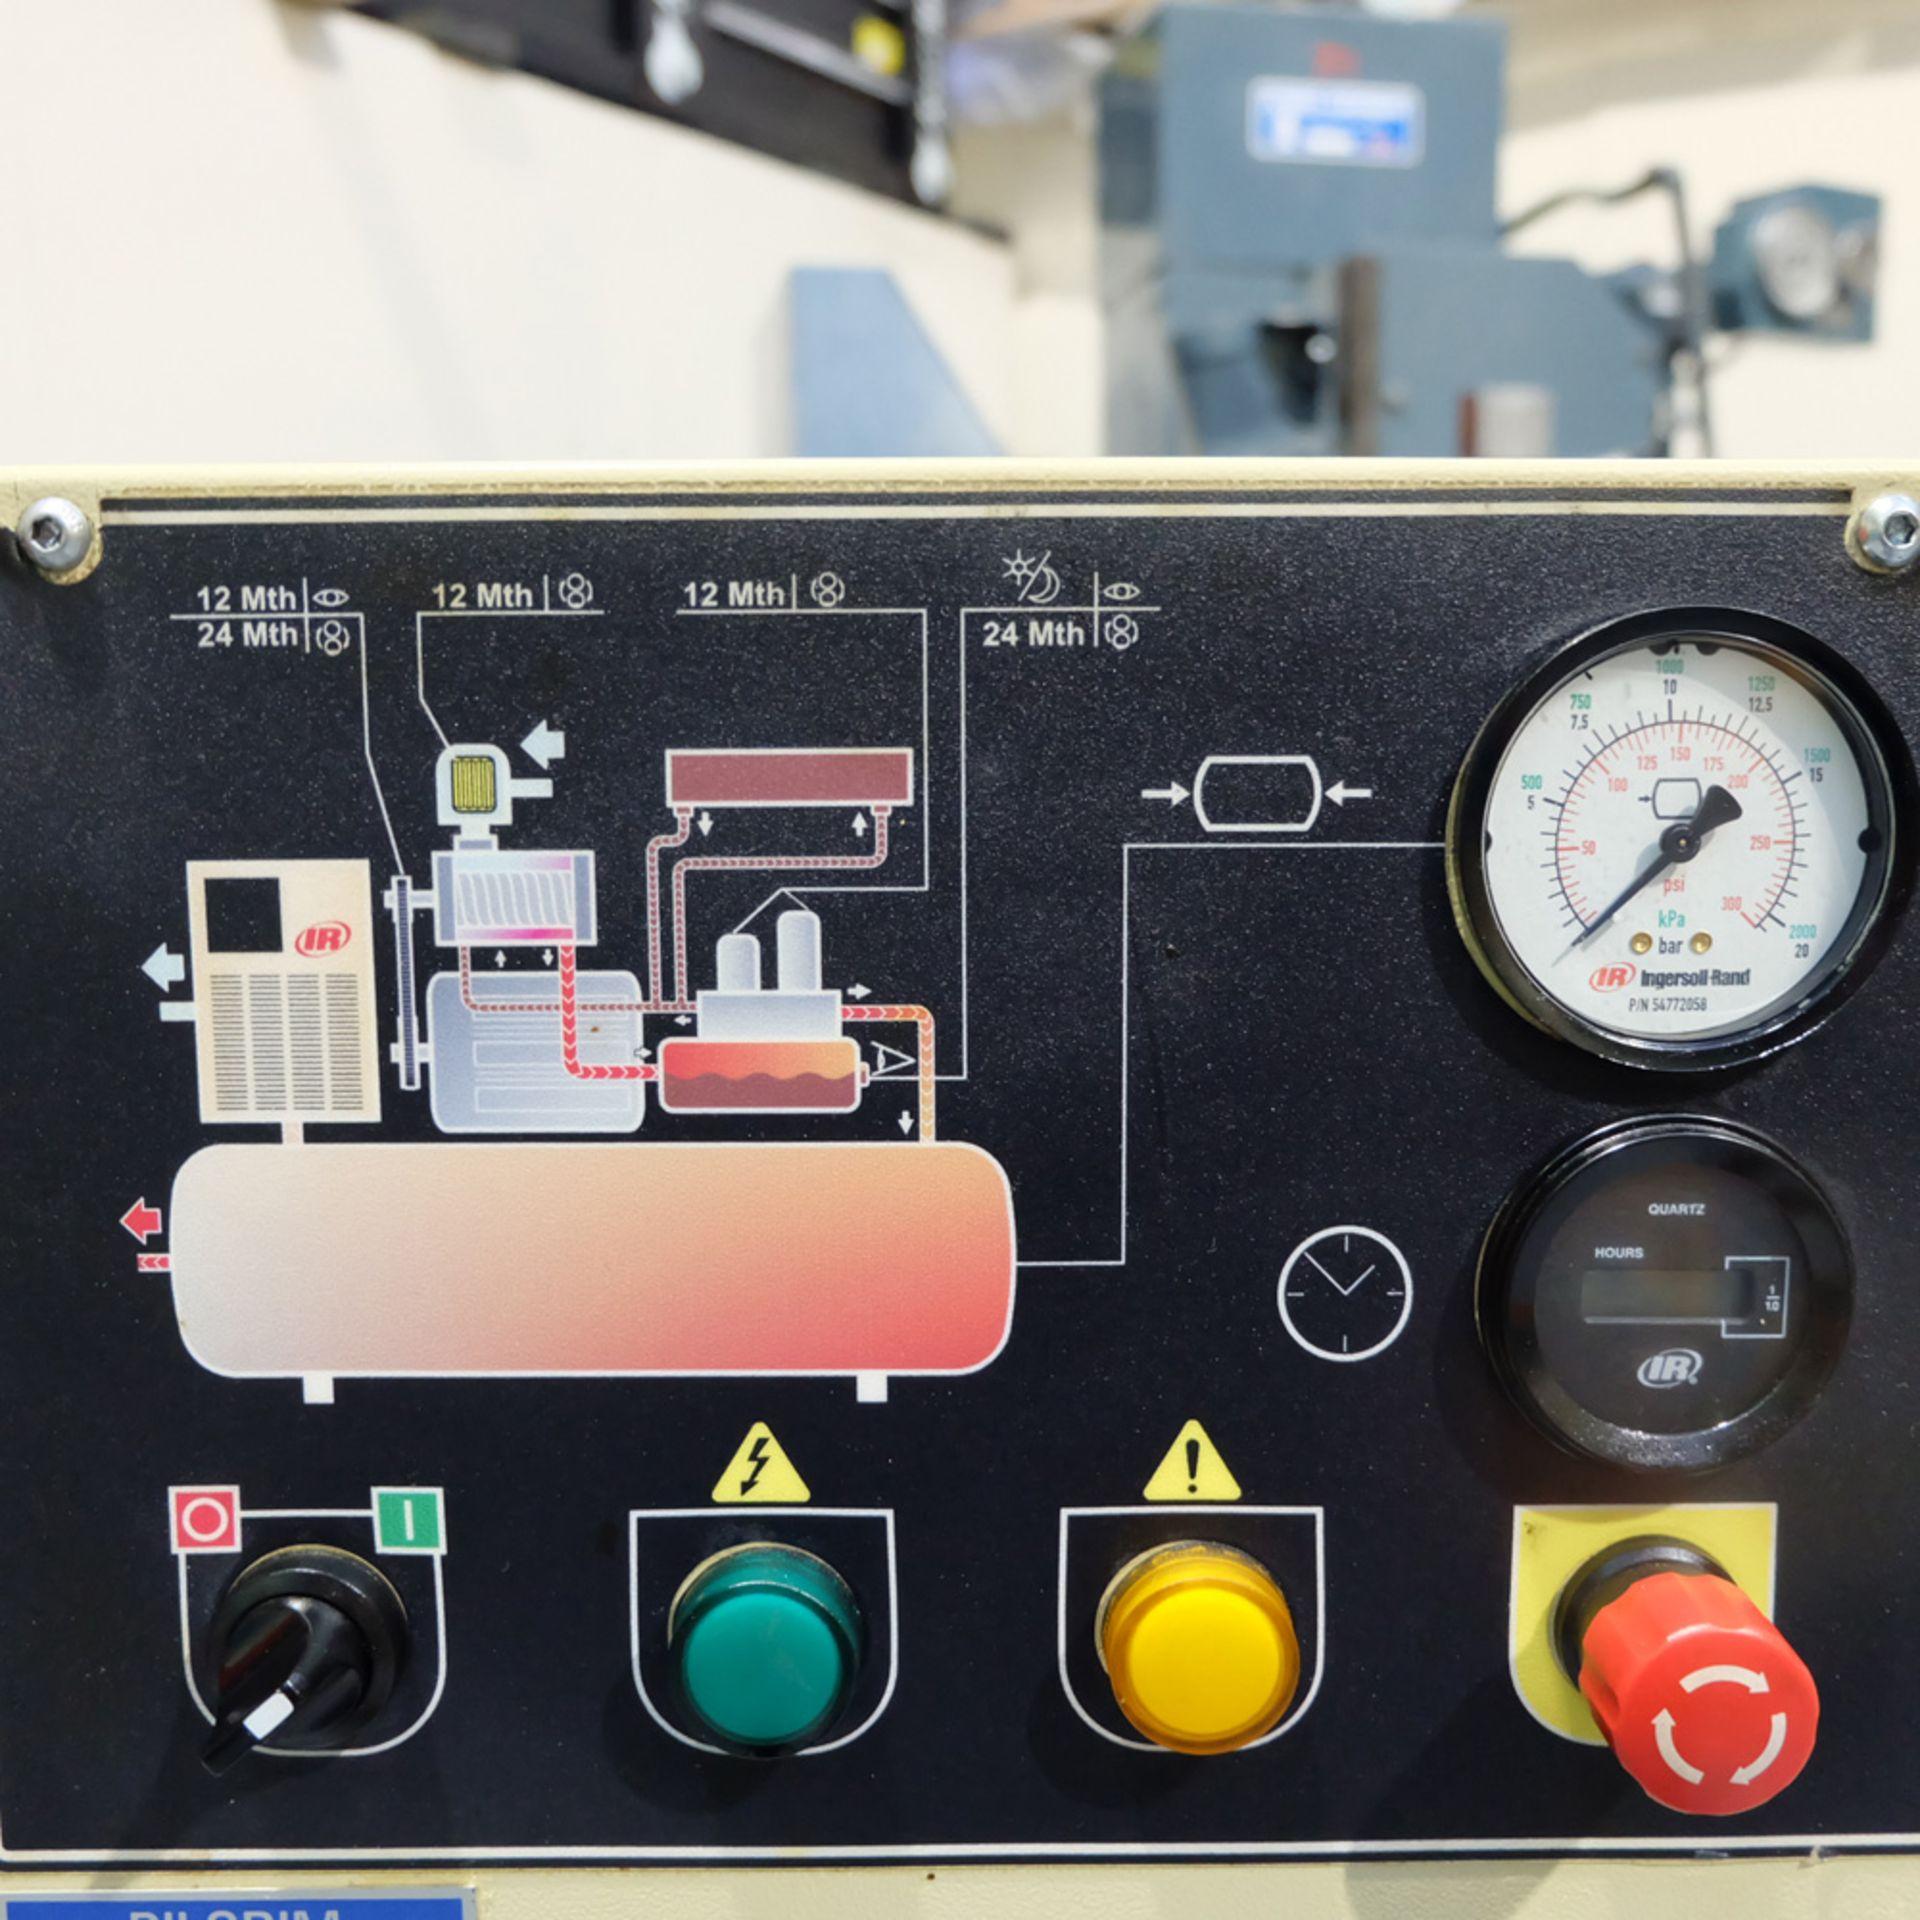 Ingersoll Rand Model R5.5IU D-SD Rotary Air Compressor. Working Pressure 10 Bar. - Image 3 of 9